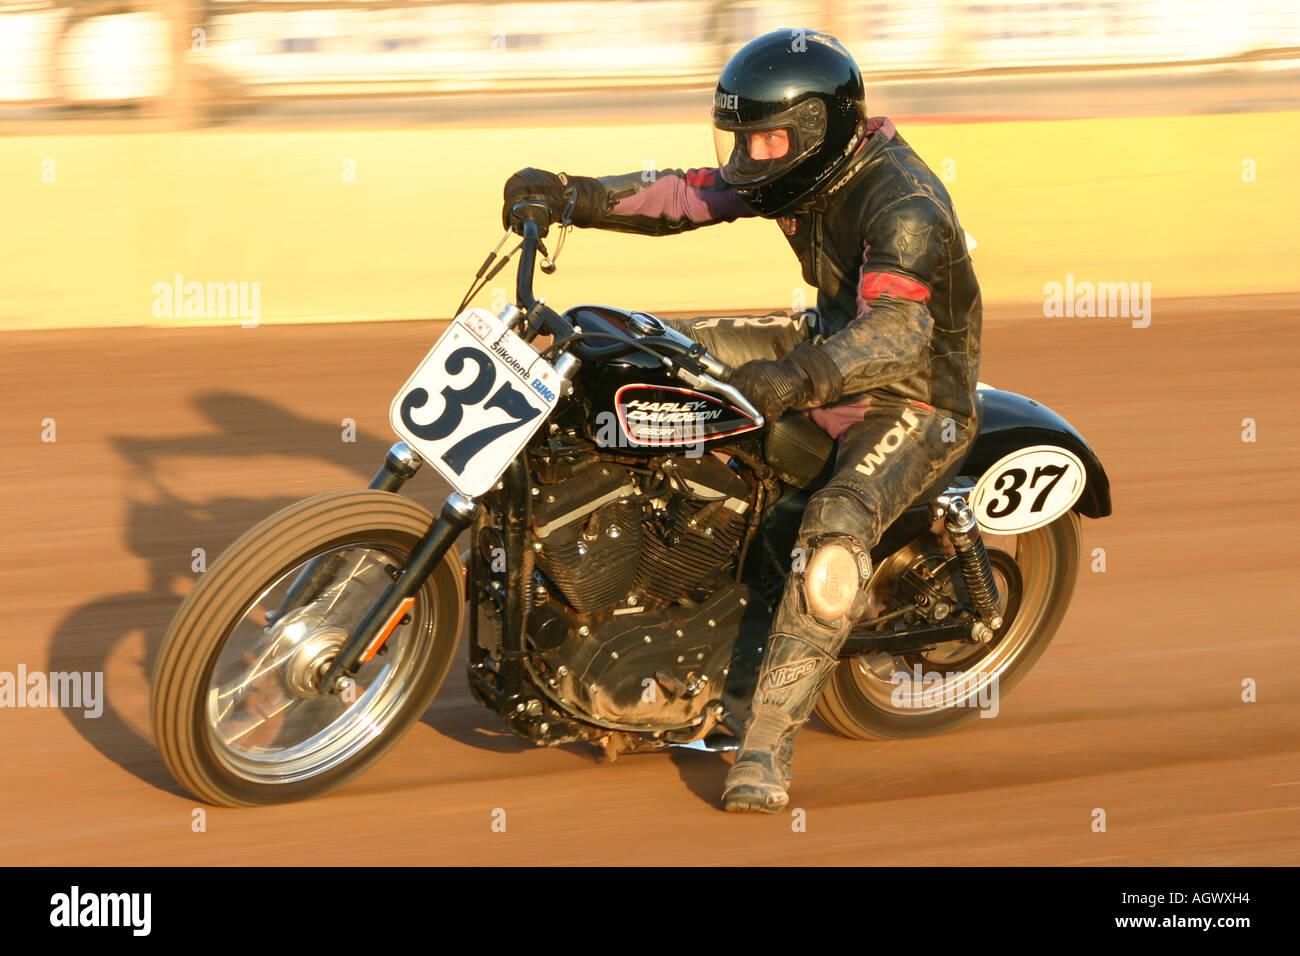 American Dirt Bike 002 Stock Photo Royalty Free Image 8167571